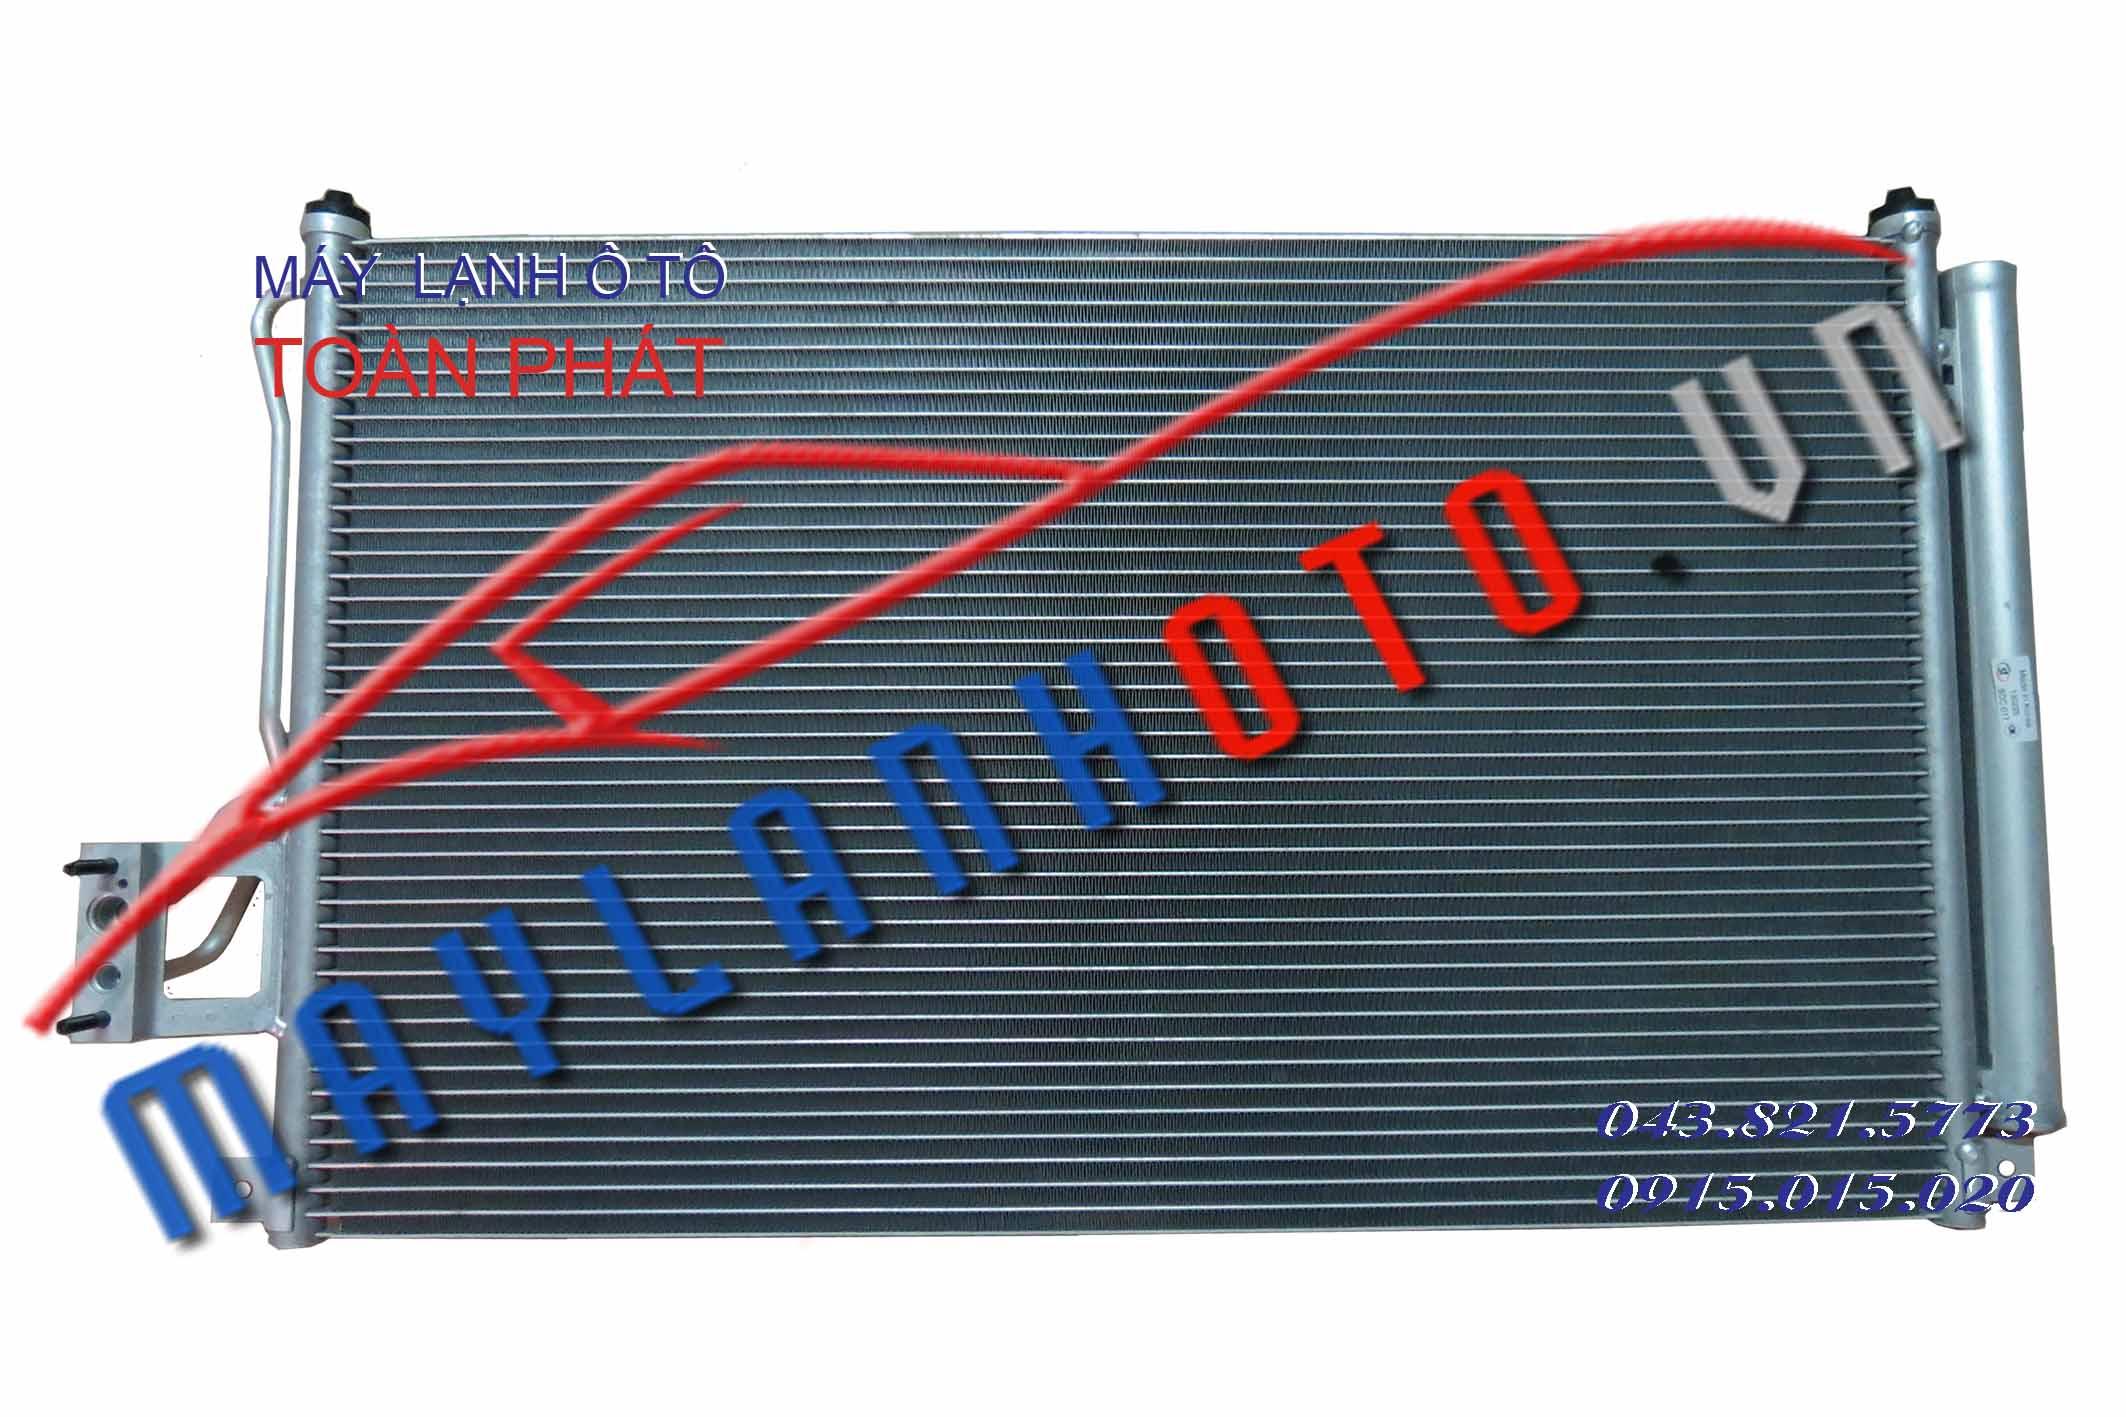 SantaFe New 2008 / Giàn nóng điều hòa Hyundai SantaFe New / Dàn nóng điều hòa Hyundai SantaFe New